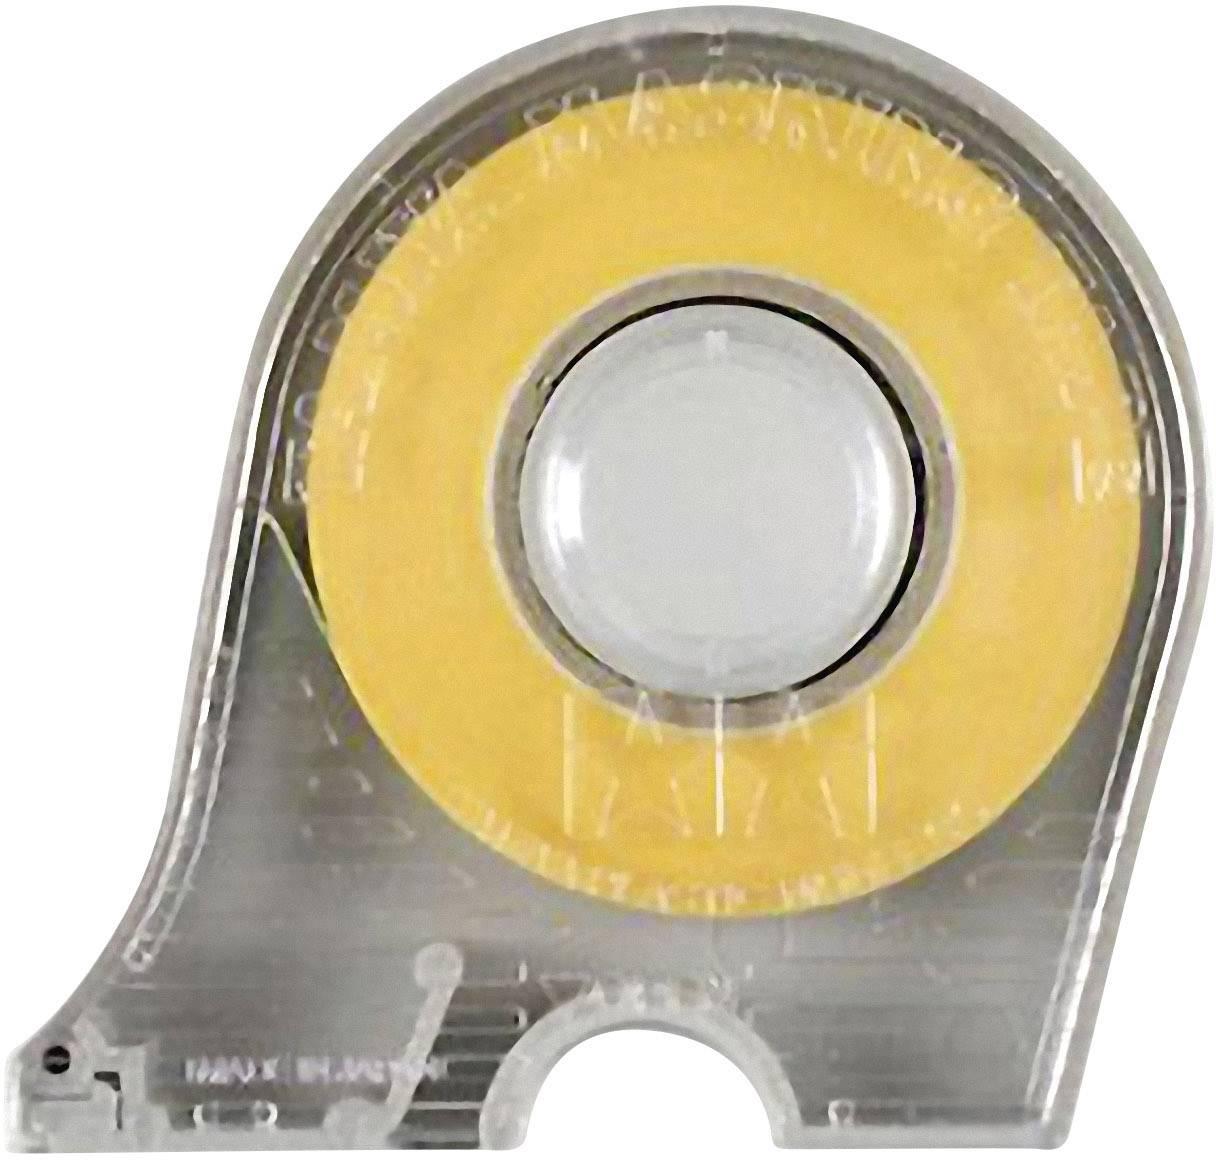 Airbrush maskovací páska Tamiya, 6 mm x 18 m